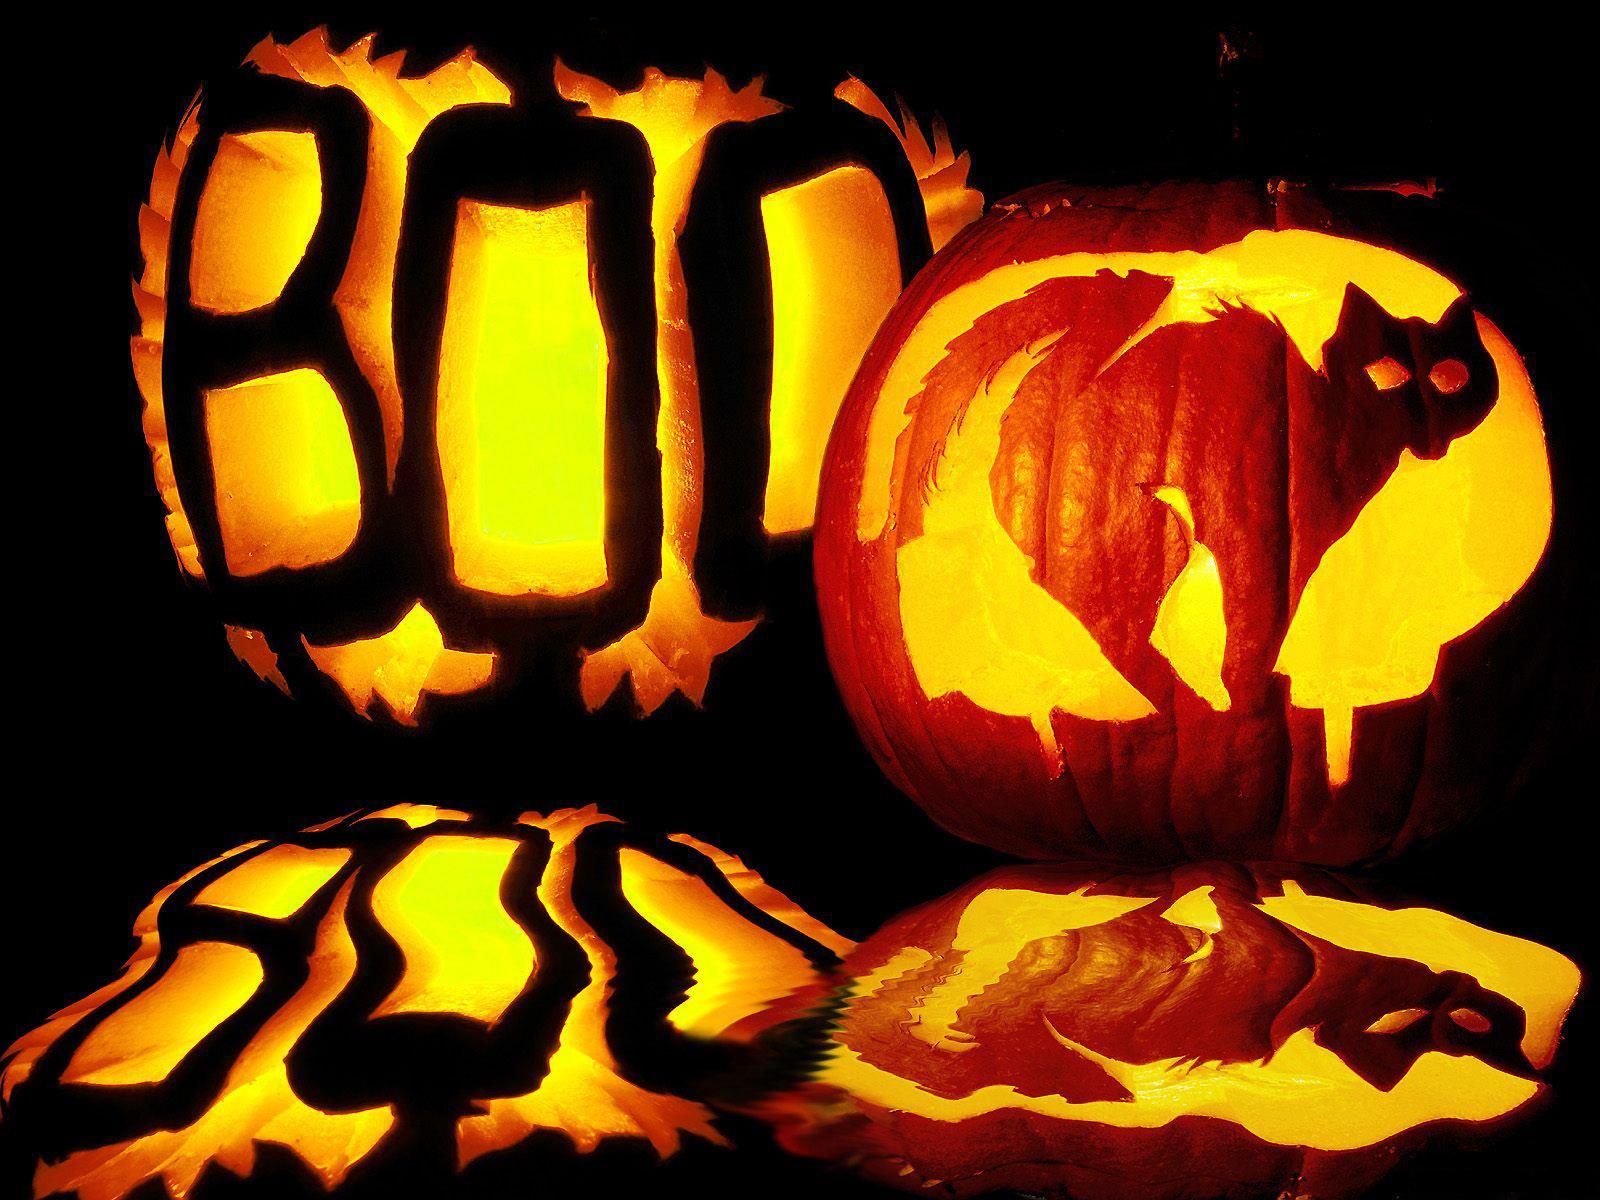 Good Wallpaper Halloween Spider - halloween-day-desktop-wallpaper-28  2018_337819.jpg